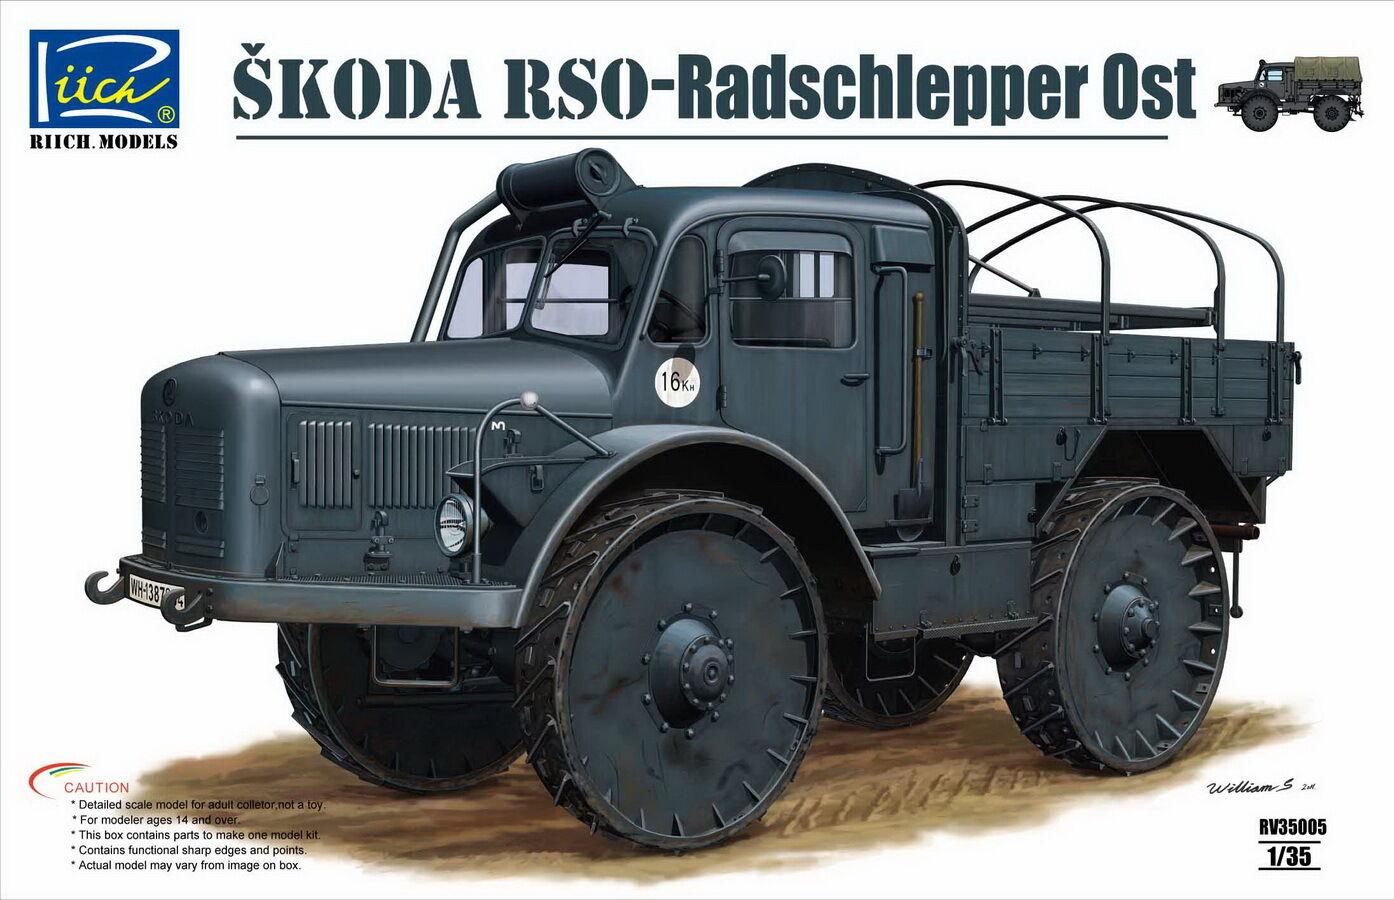 Tracteur lourd Allemand 4x4 SKODA RSO - KIT RIICH MODELS 1 35 N° 35005